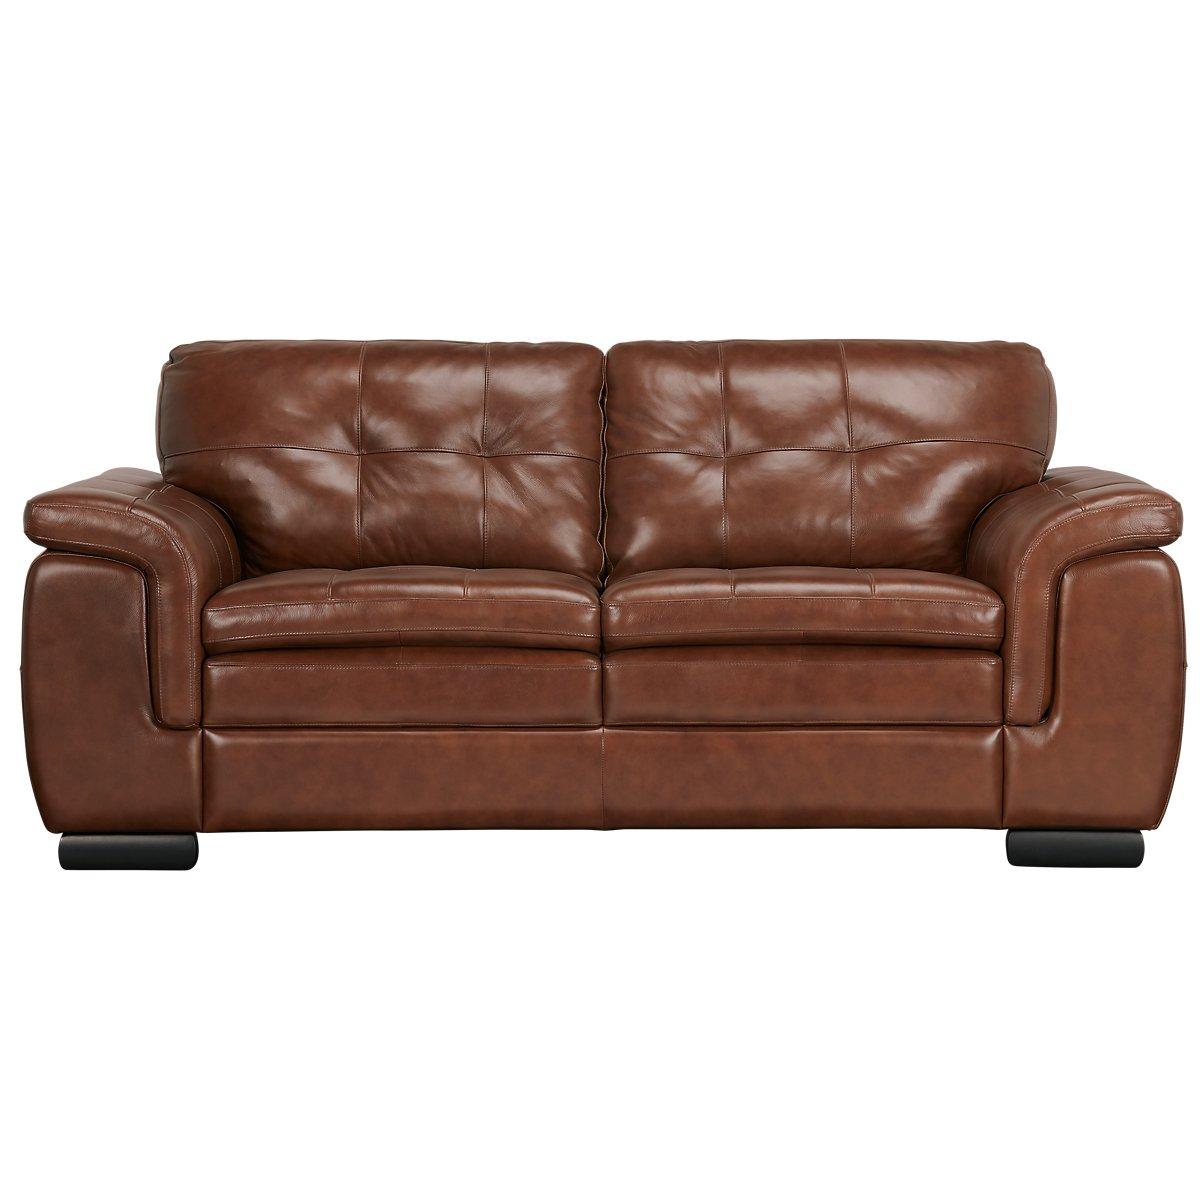 Trevor medium brown leather loveseat